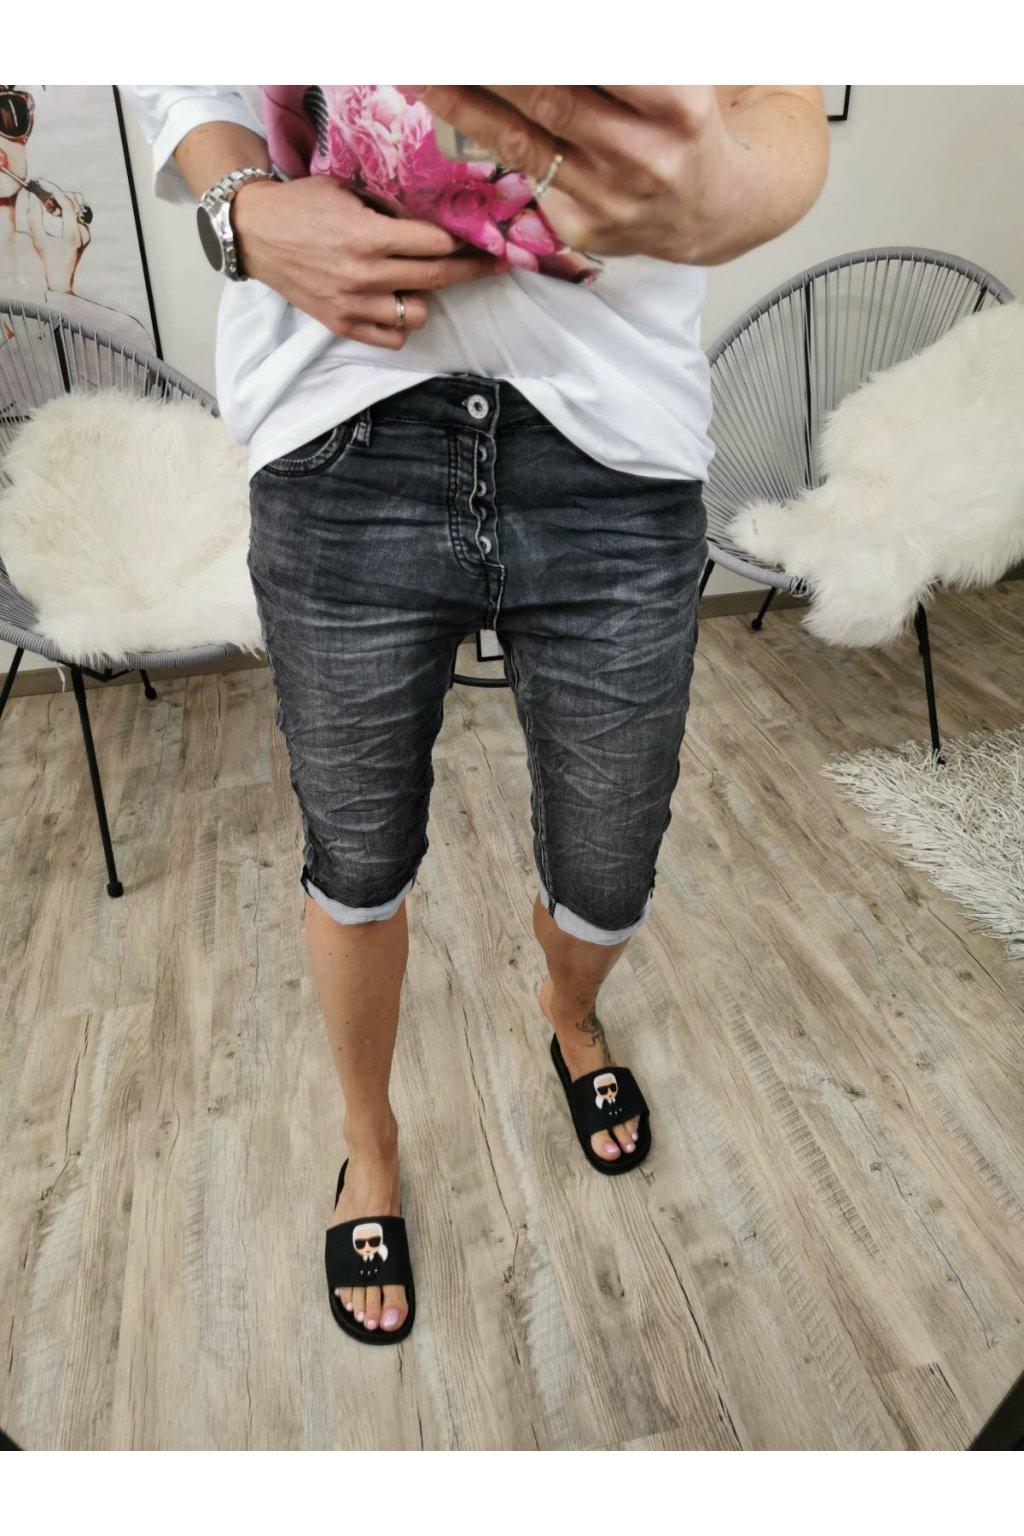 Dámské džínové kraťasy tmavě šedé